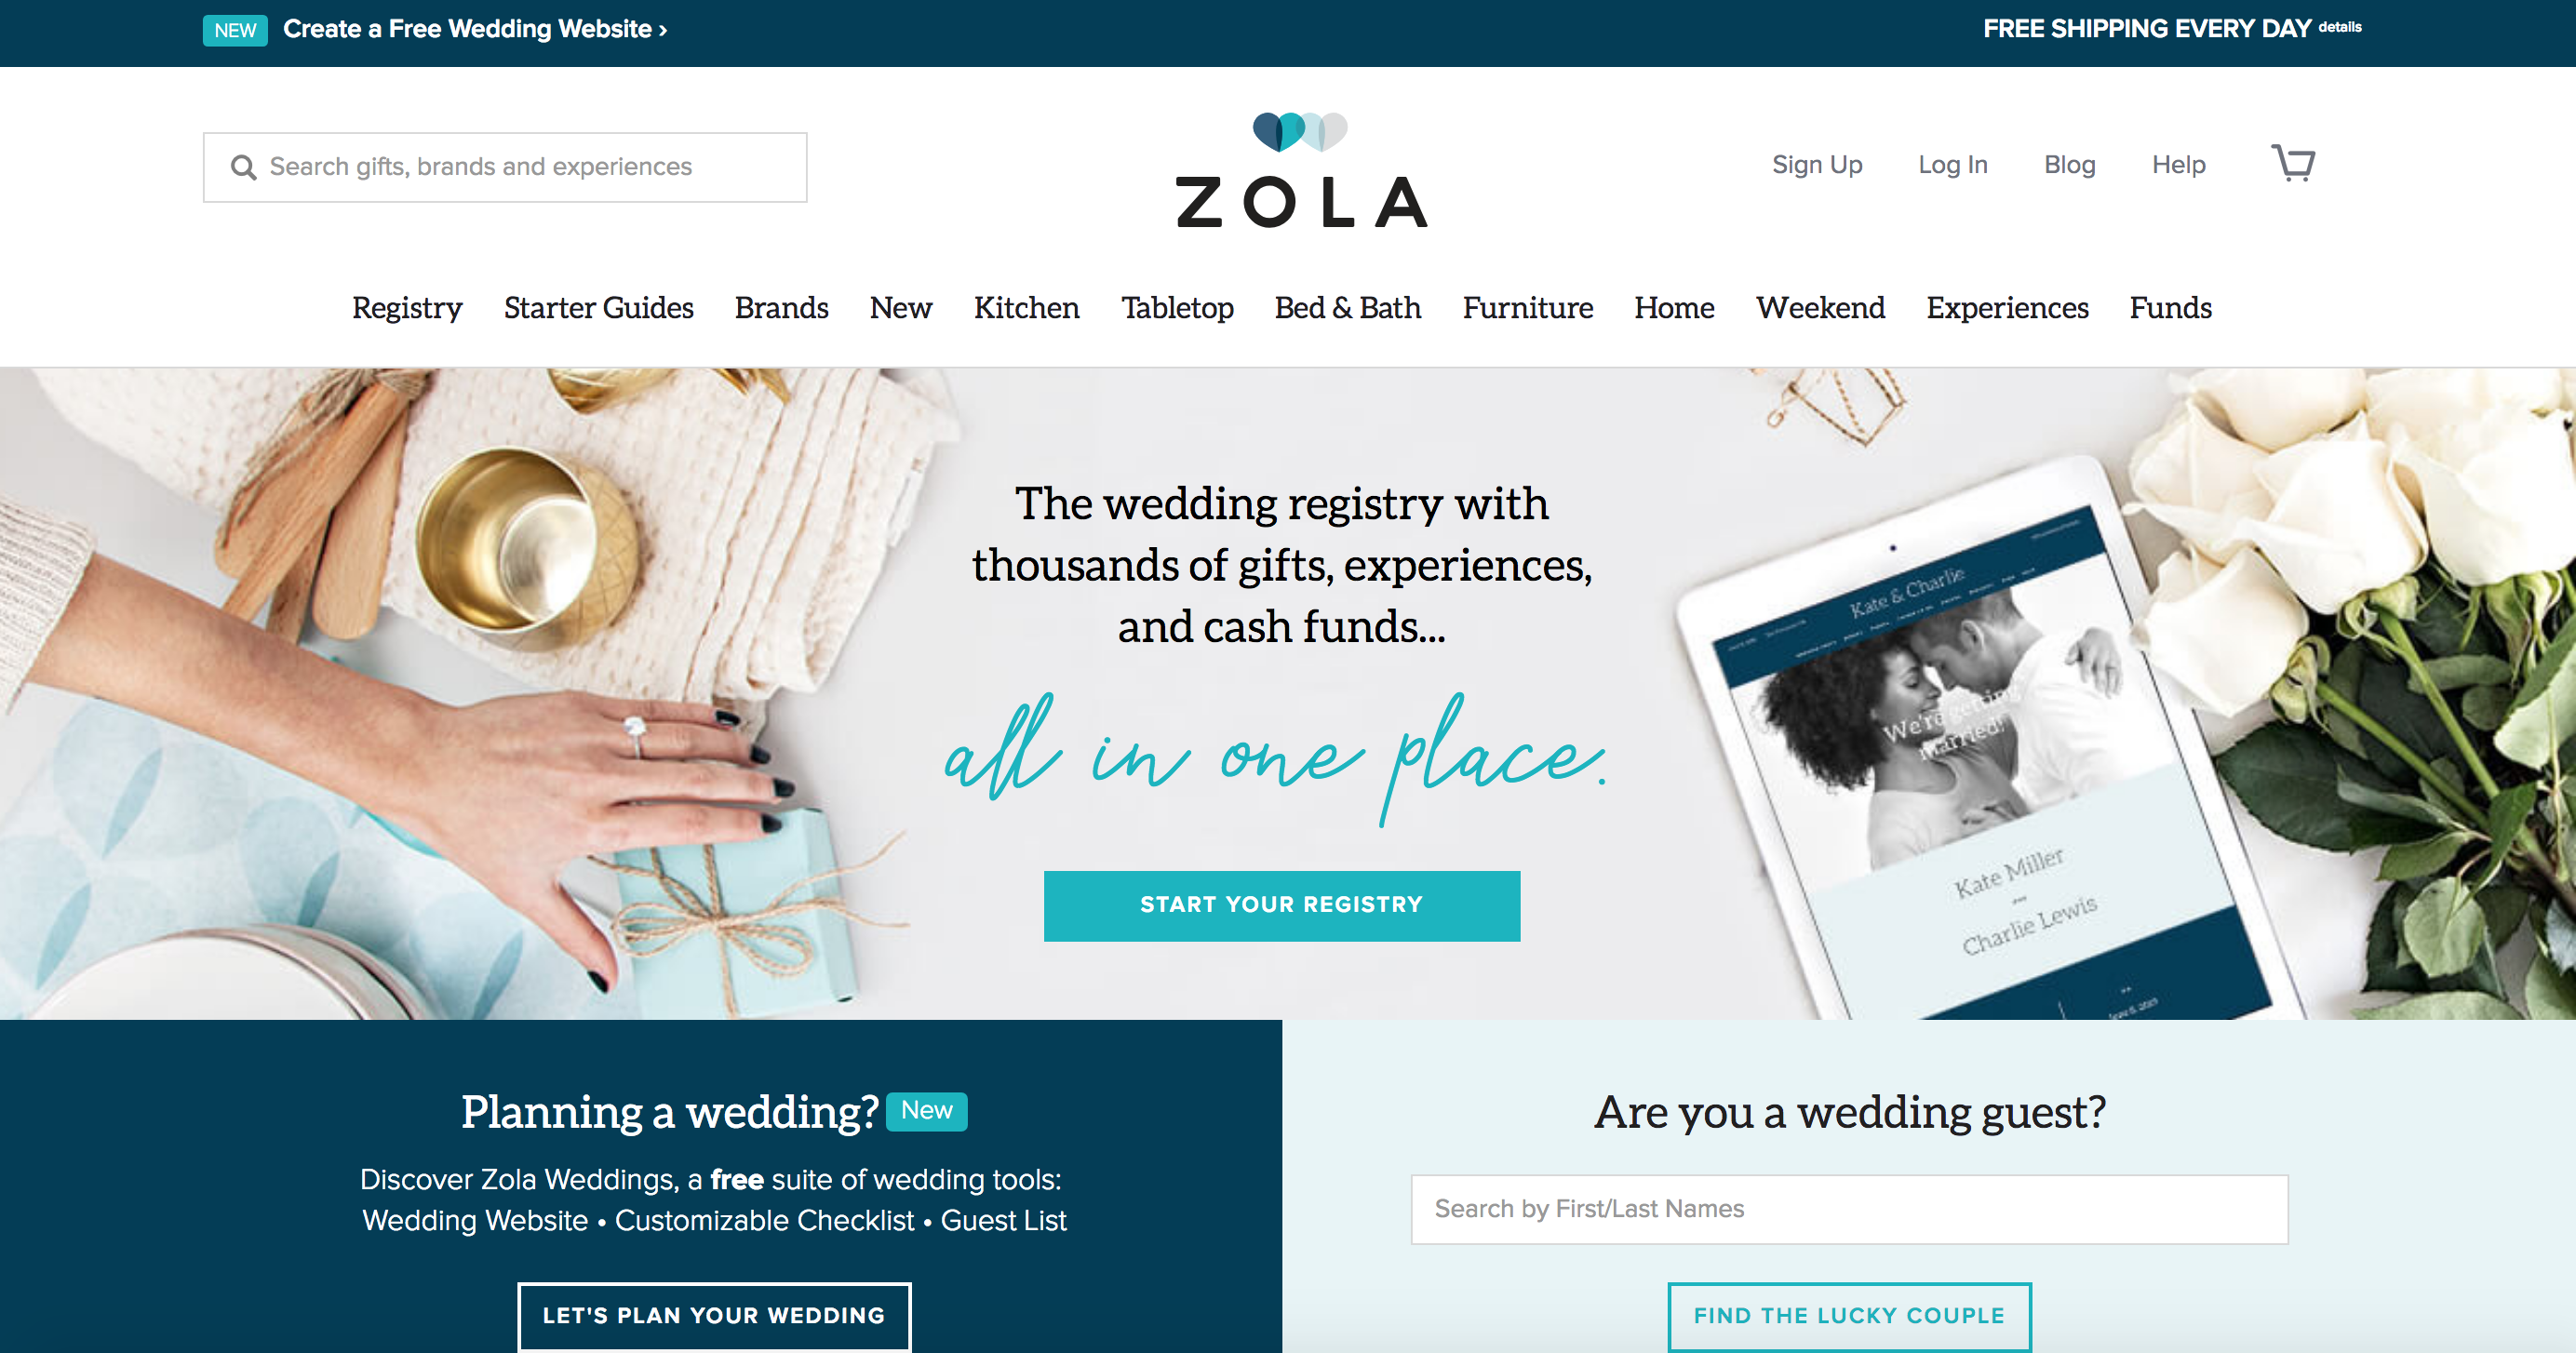 zola wedding funding nbc today show